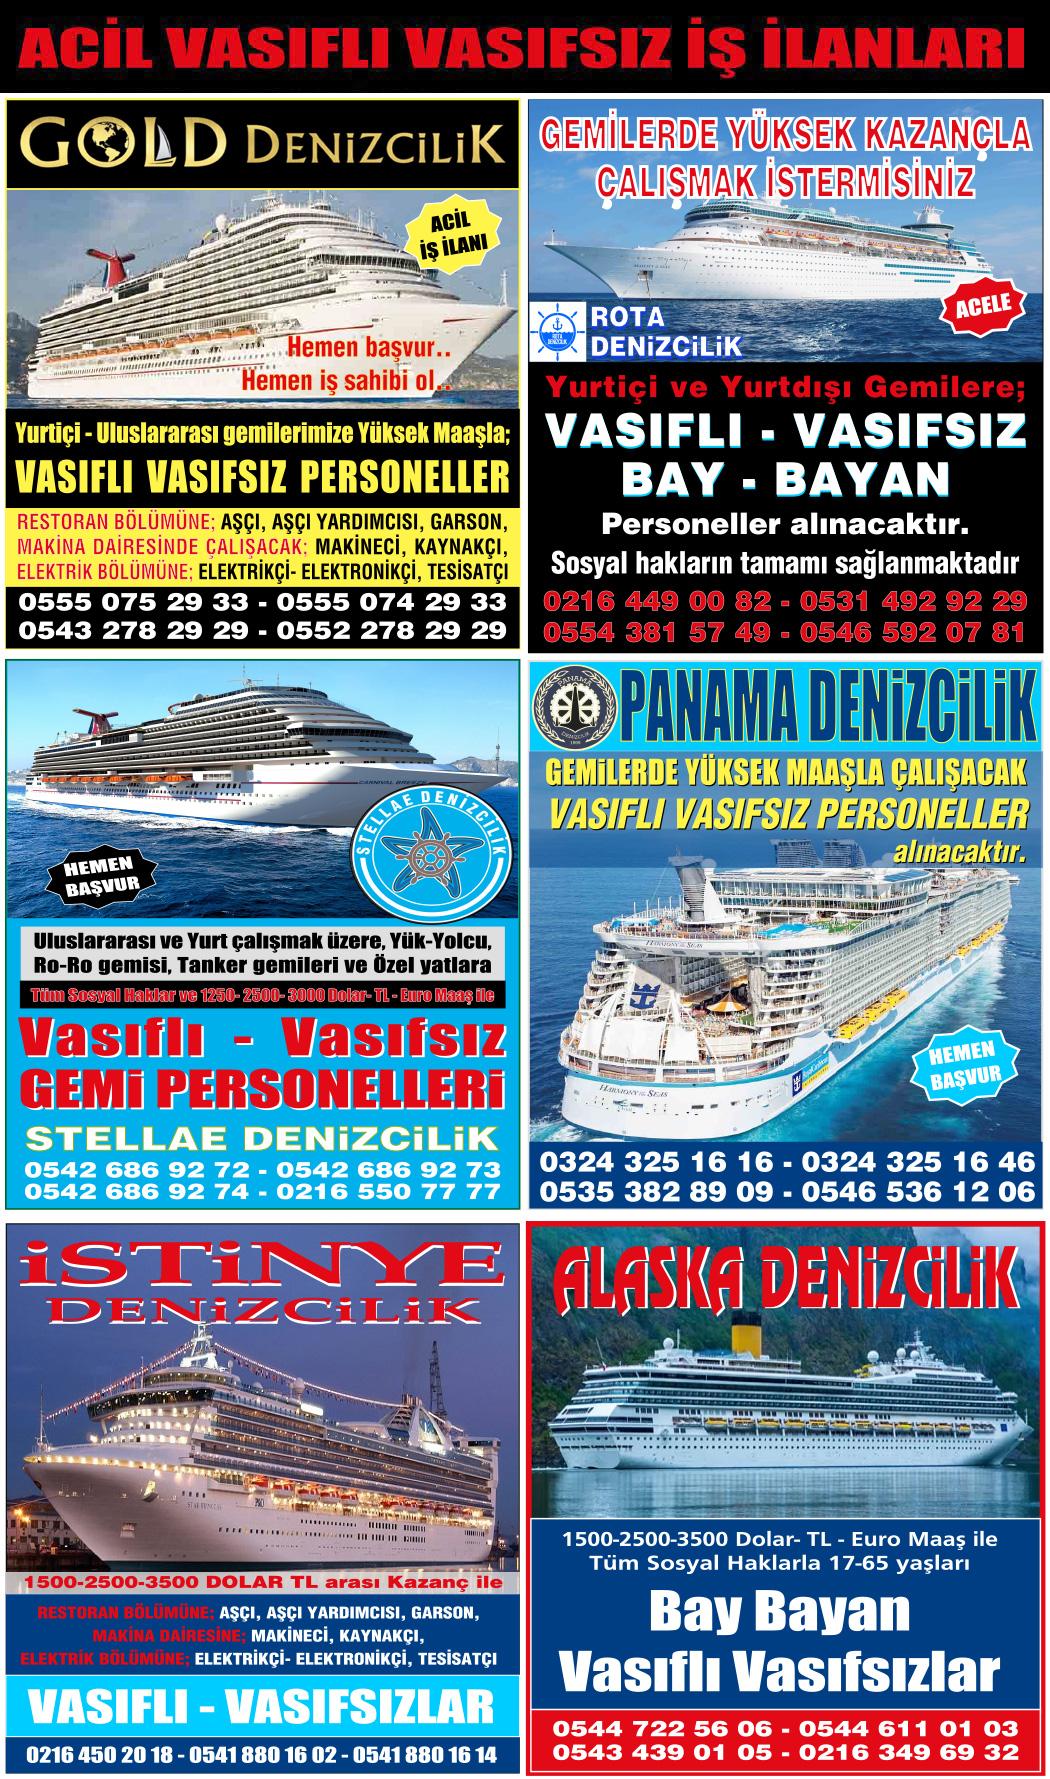 Port Ship's denizcilik iş ilanları, vasıfsız eleman ilanı, acil iş ilanları